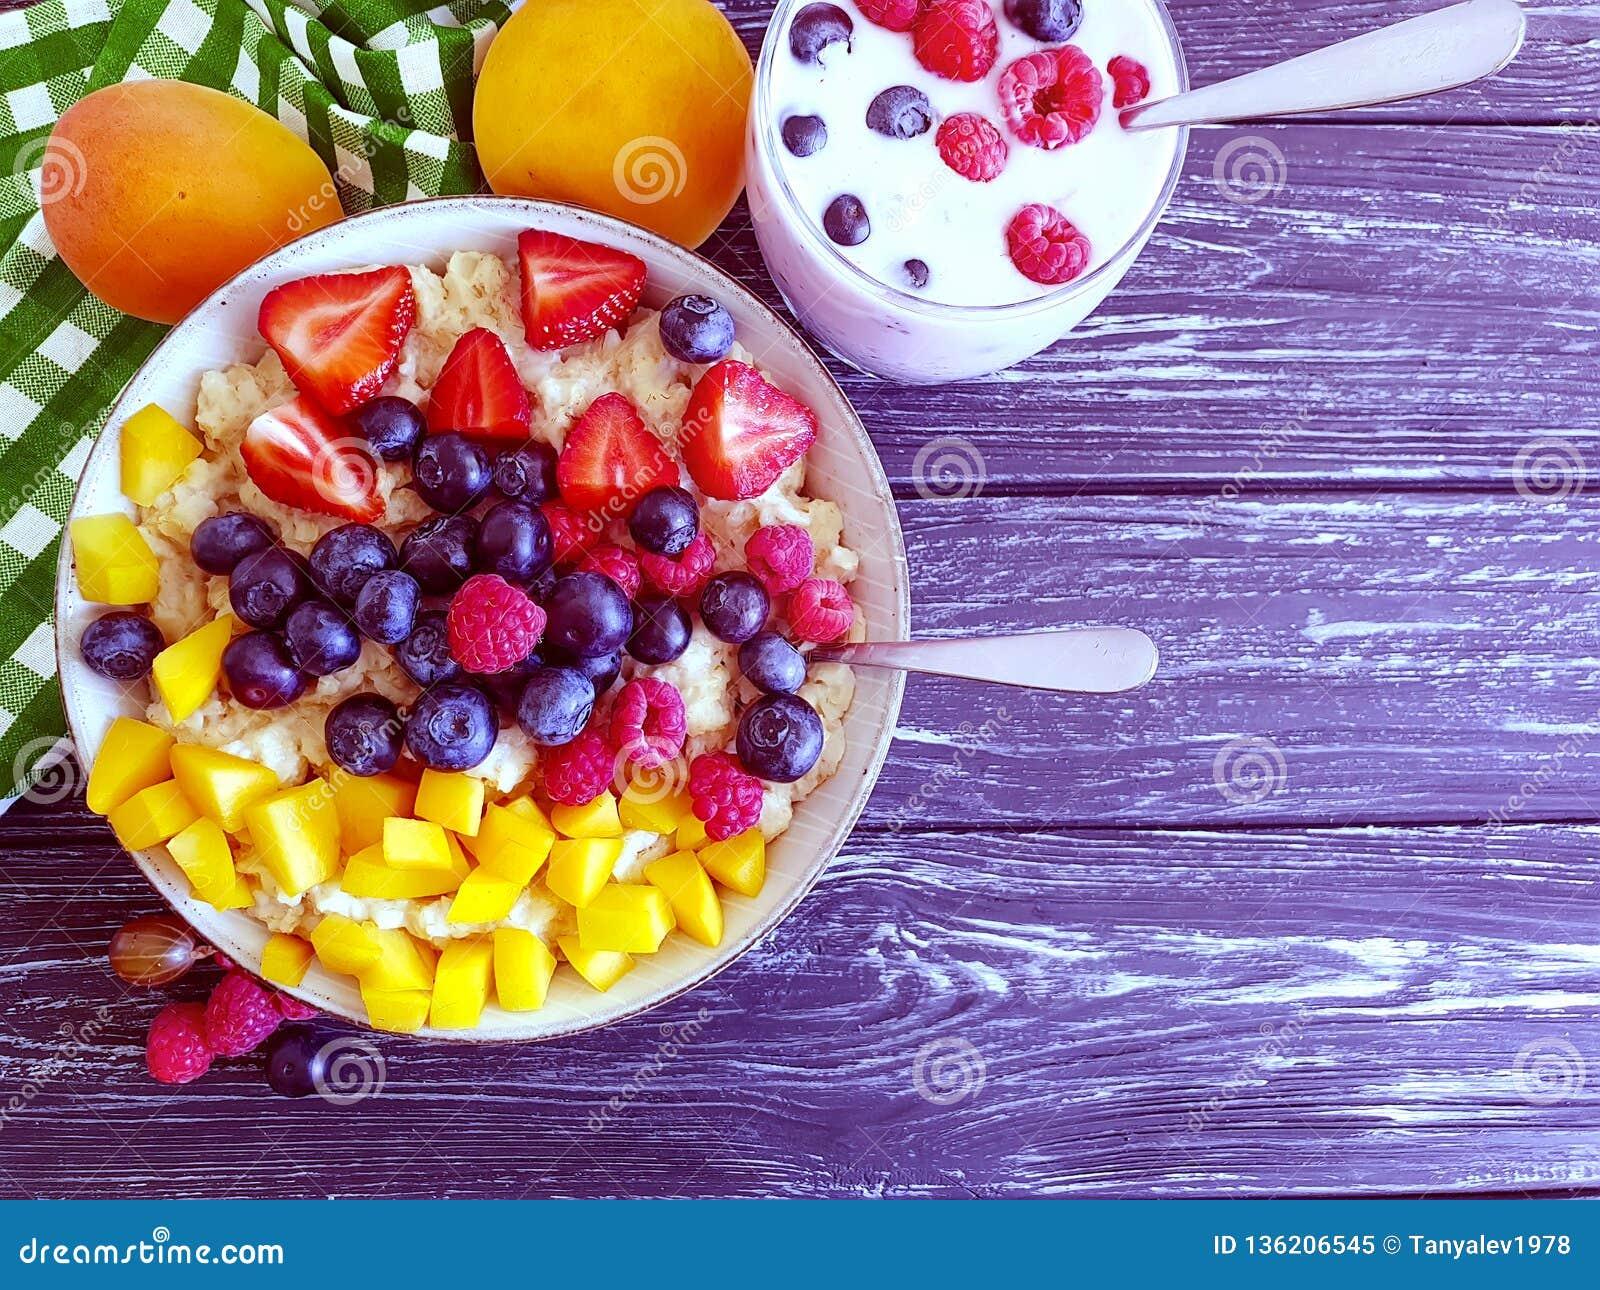 Farinha de aveia, abricó, morango, iogurte natural antioxidante delicioso no fundo de madeira